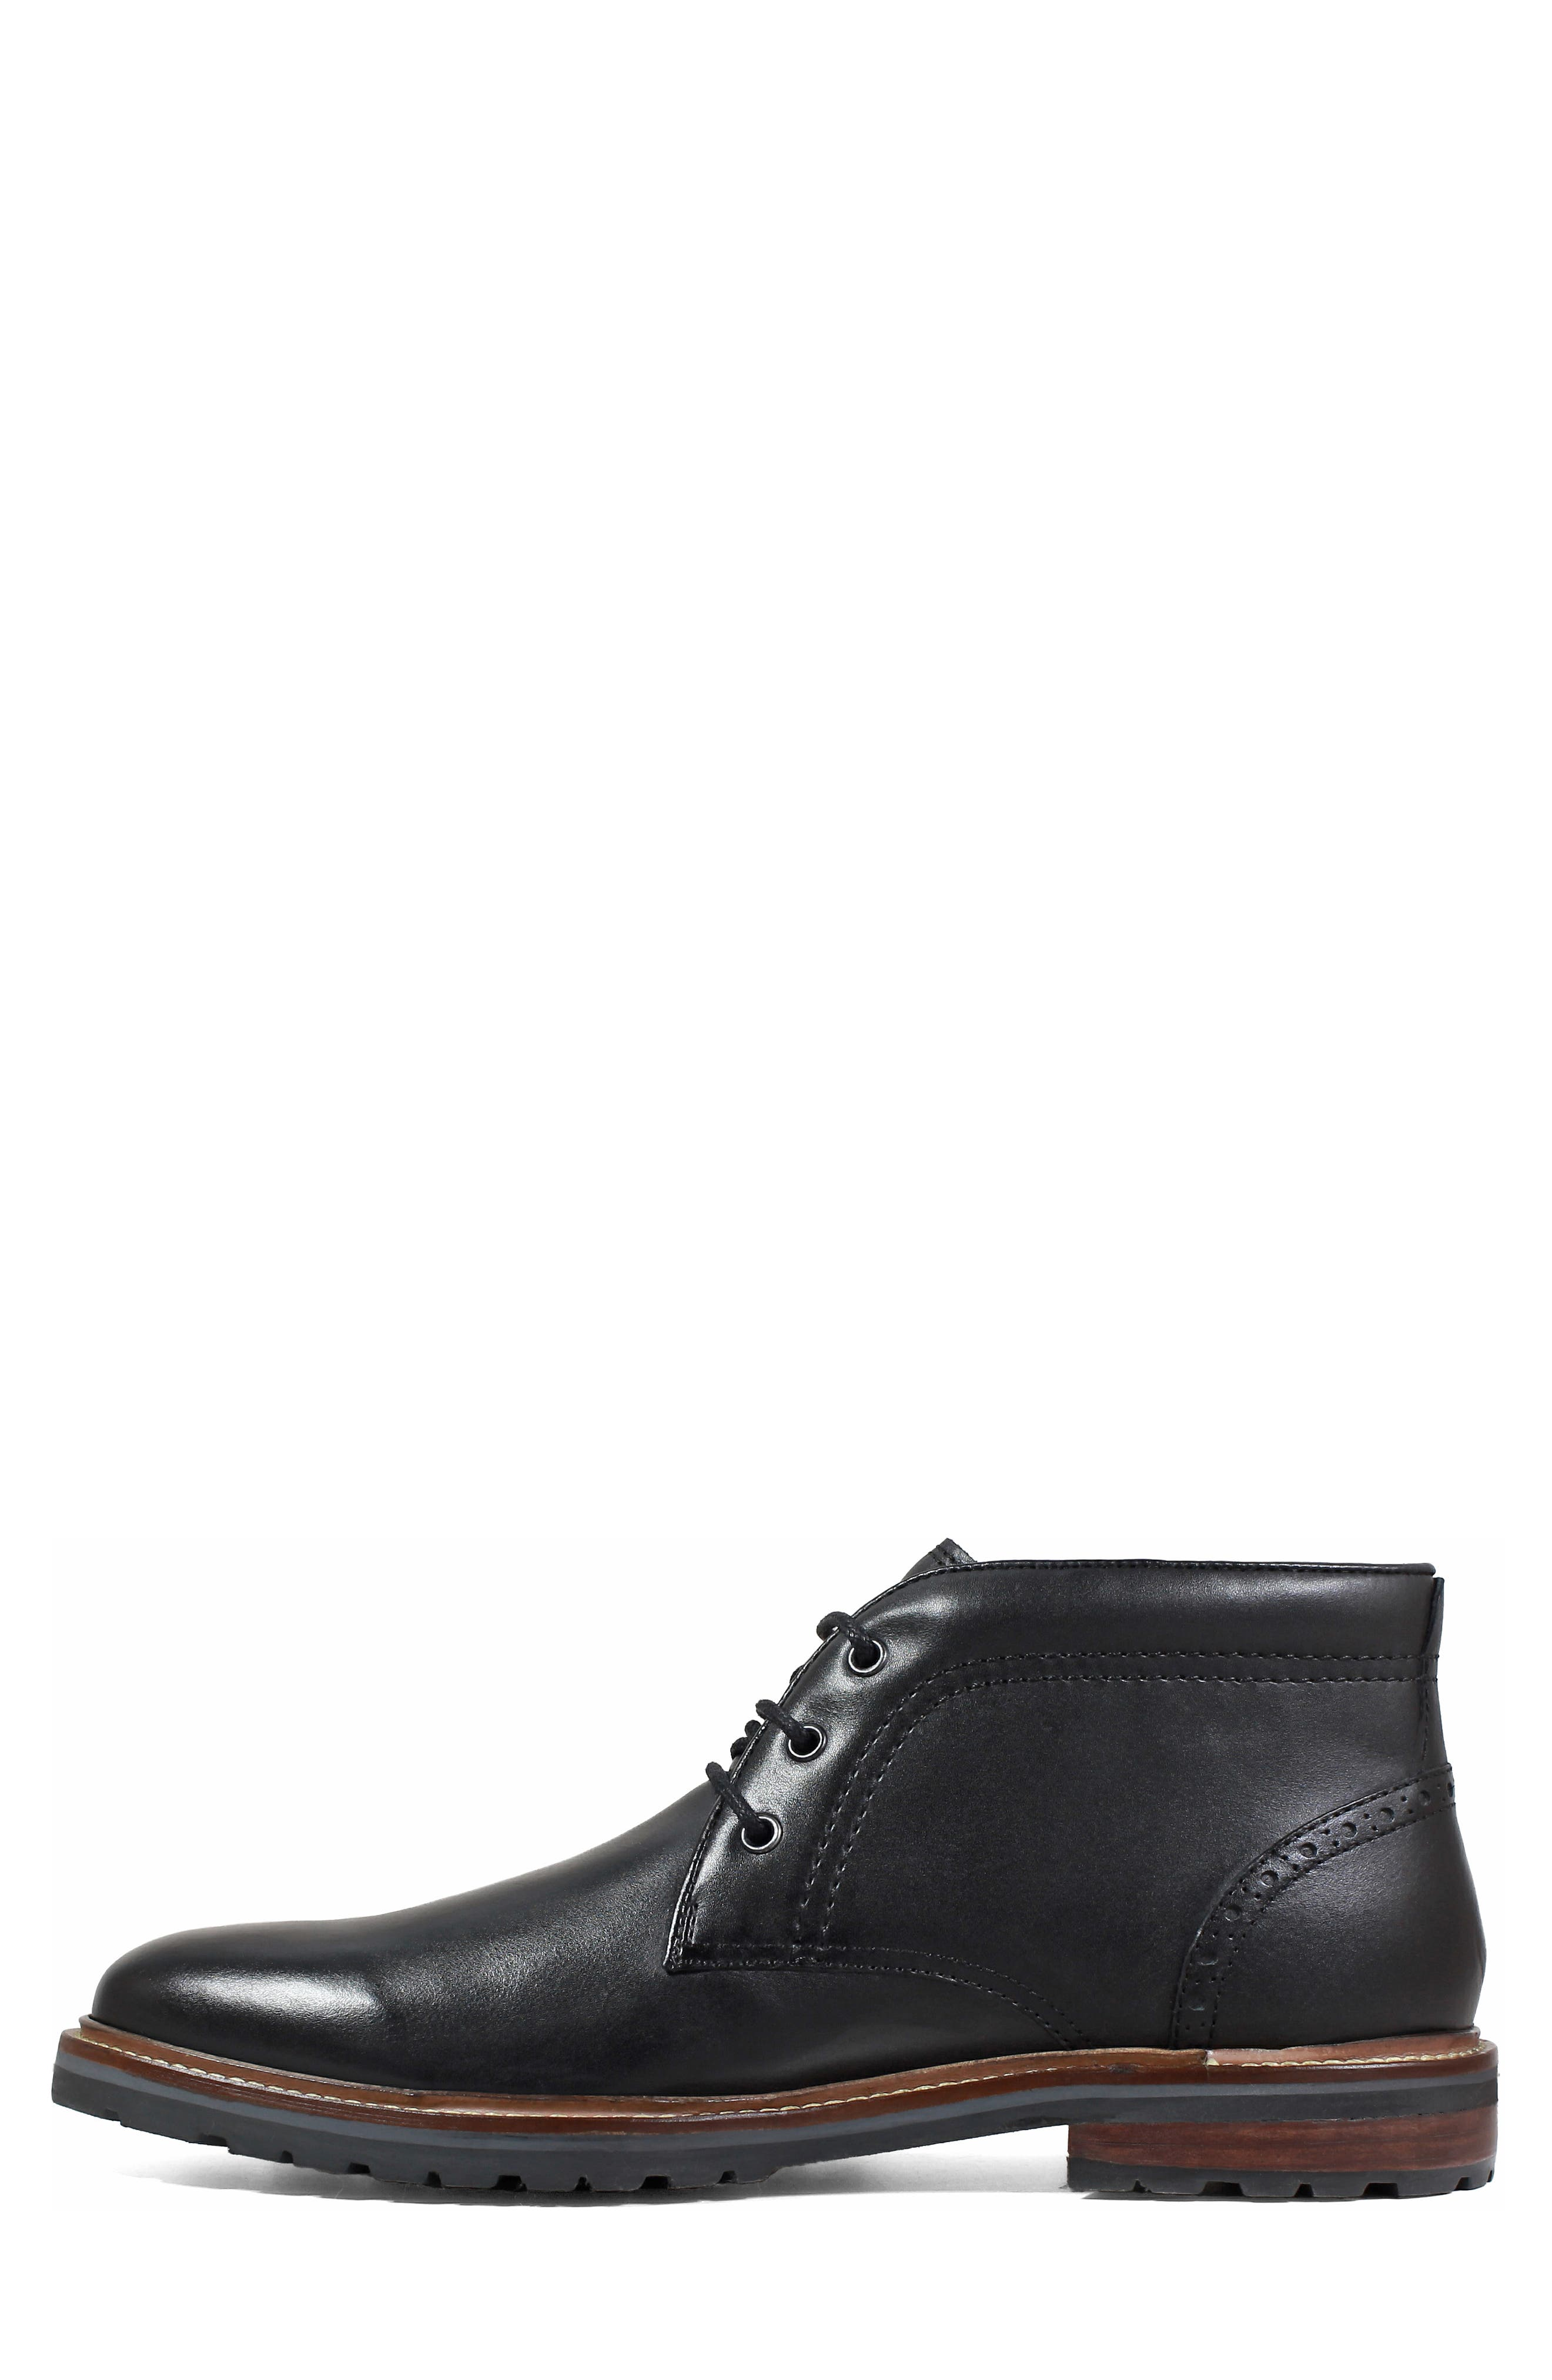 FLORSHEIM, Estabrook Lugged Chukka Boot, Alternate thumbnail 8, color, BLACK LEATHER